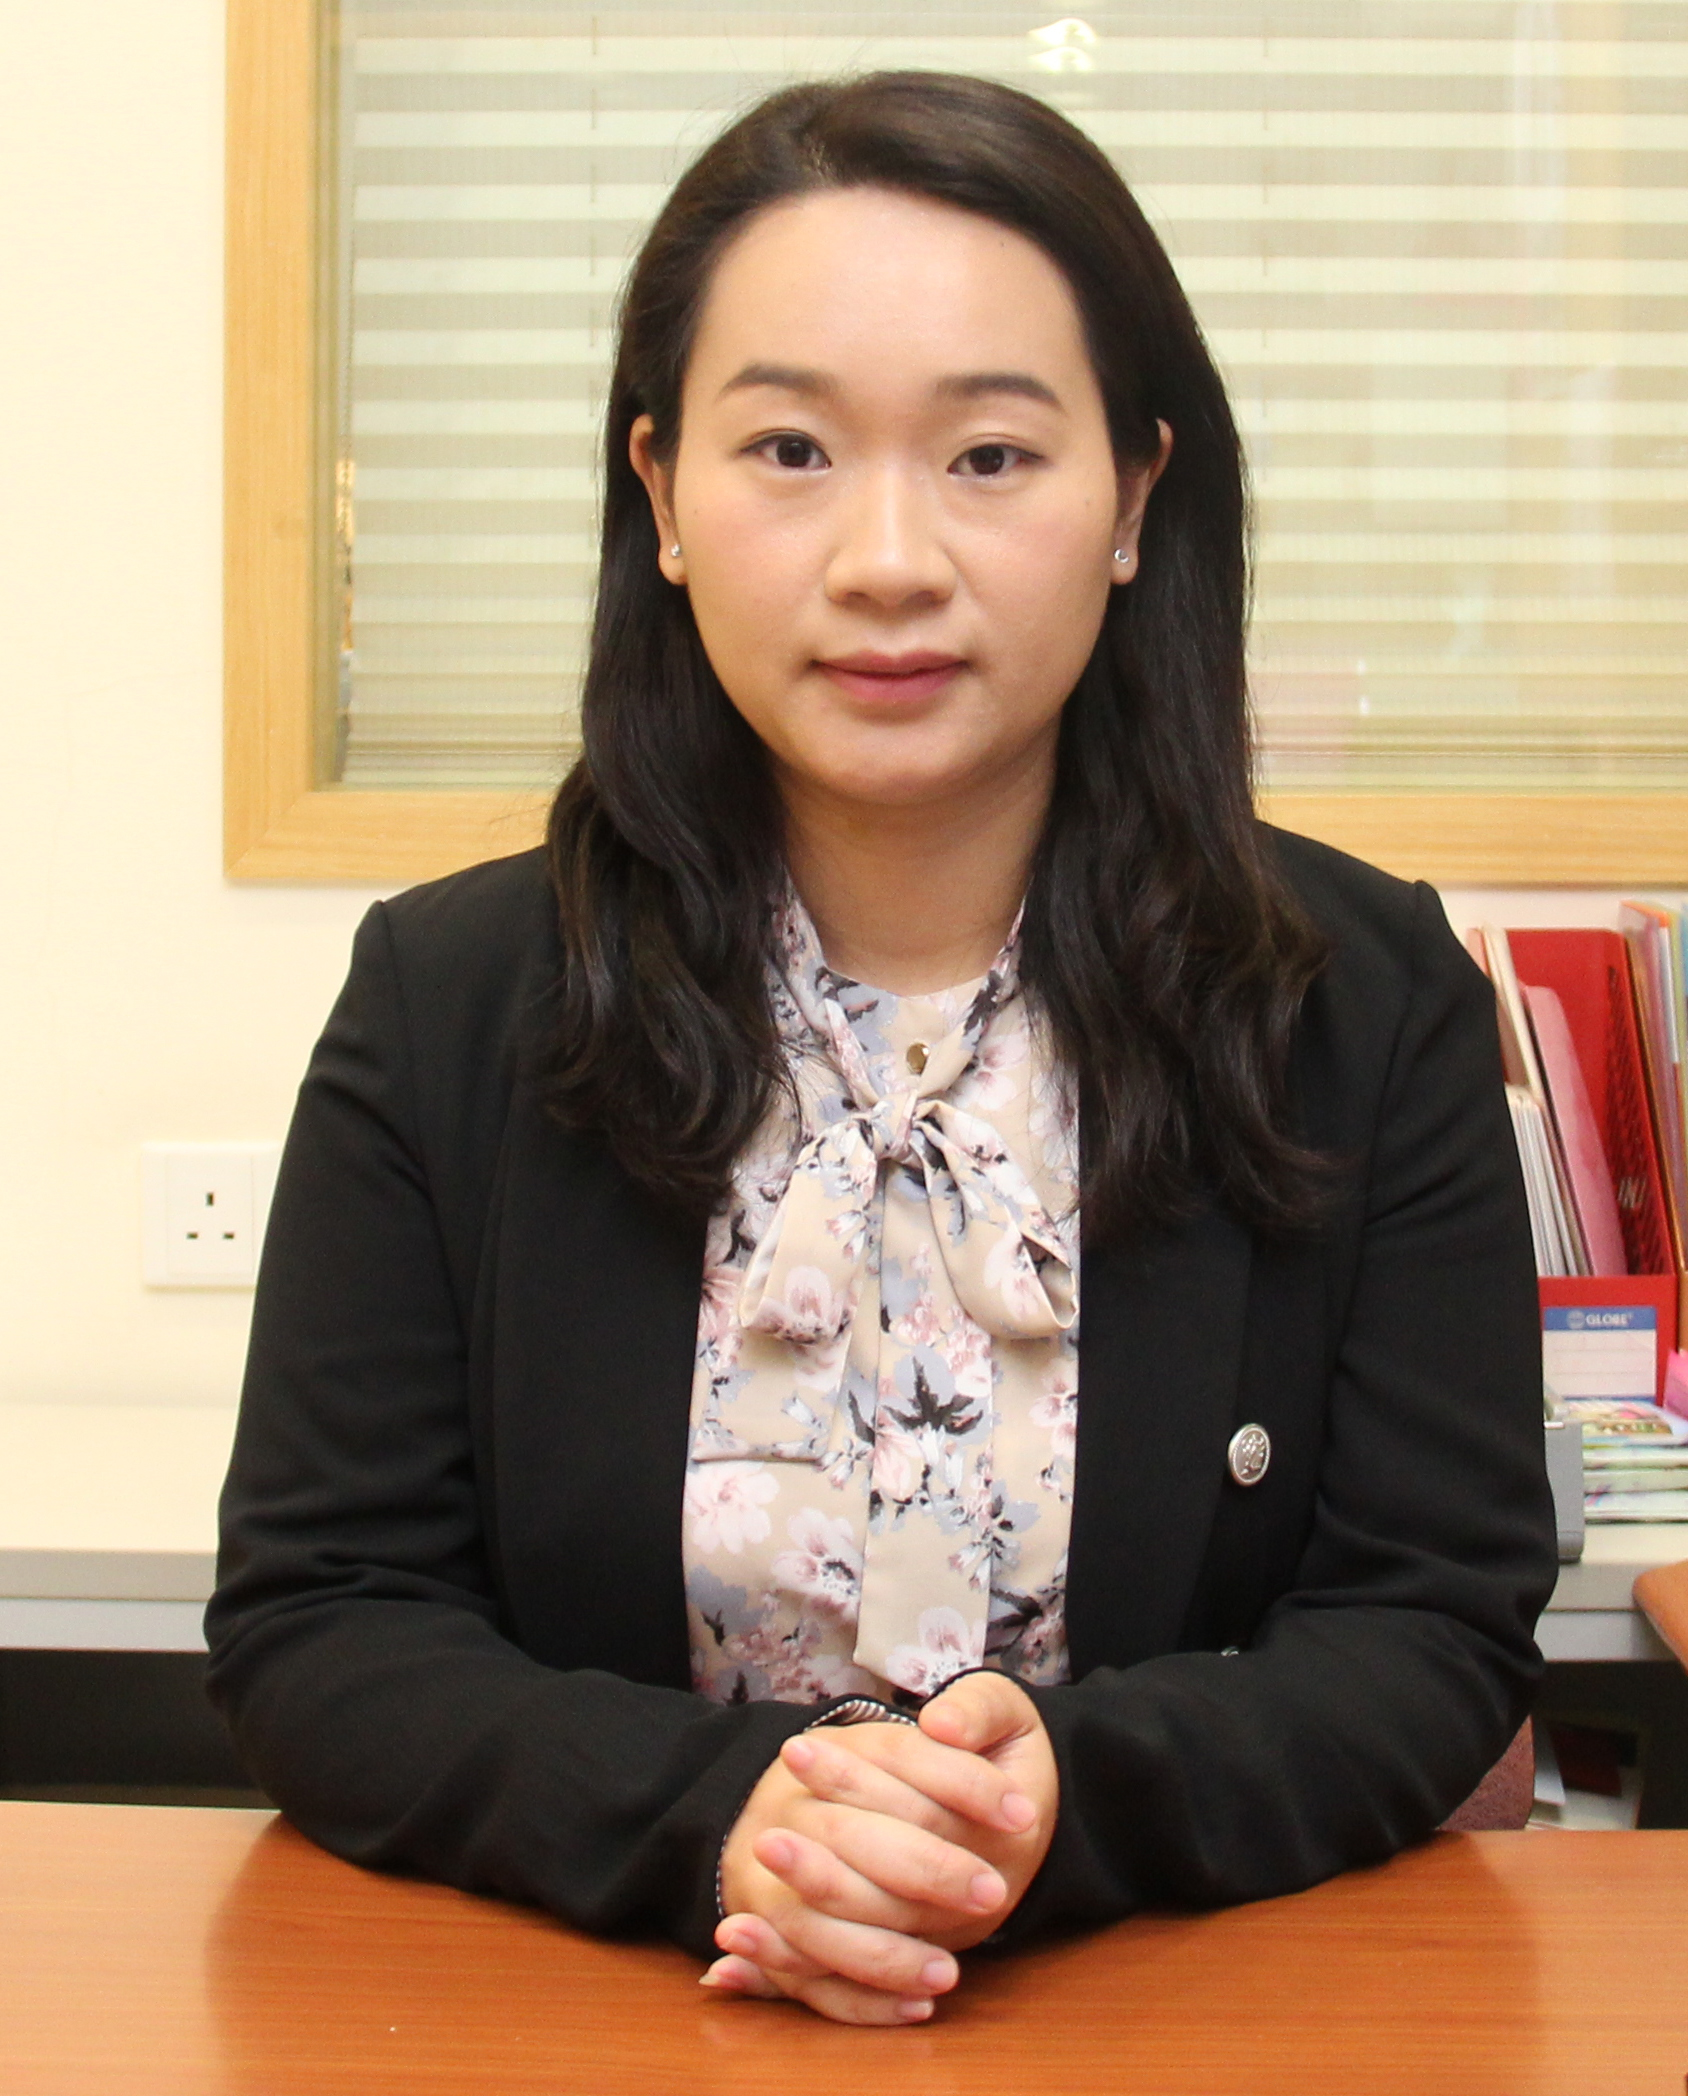 Cancro | Wong Kit Cheng pede mais diagnósticos gratuitos